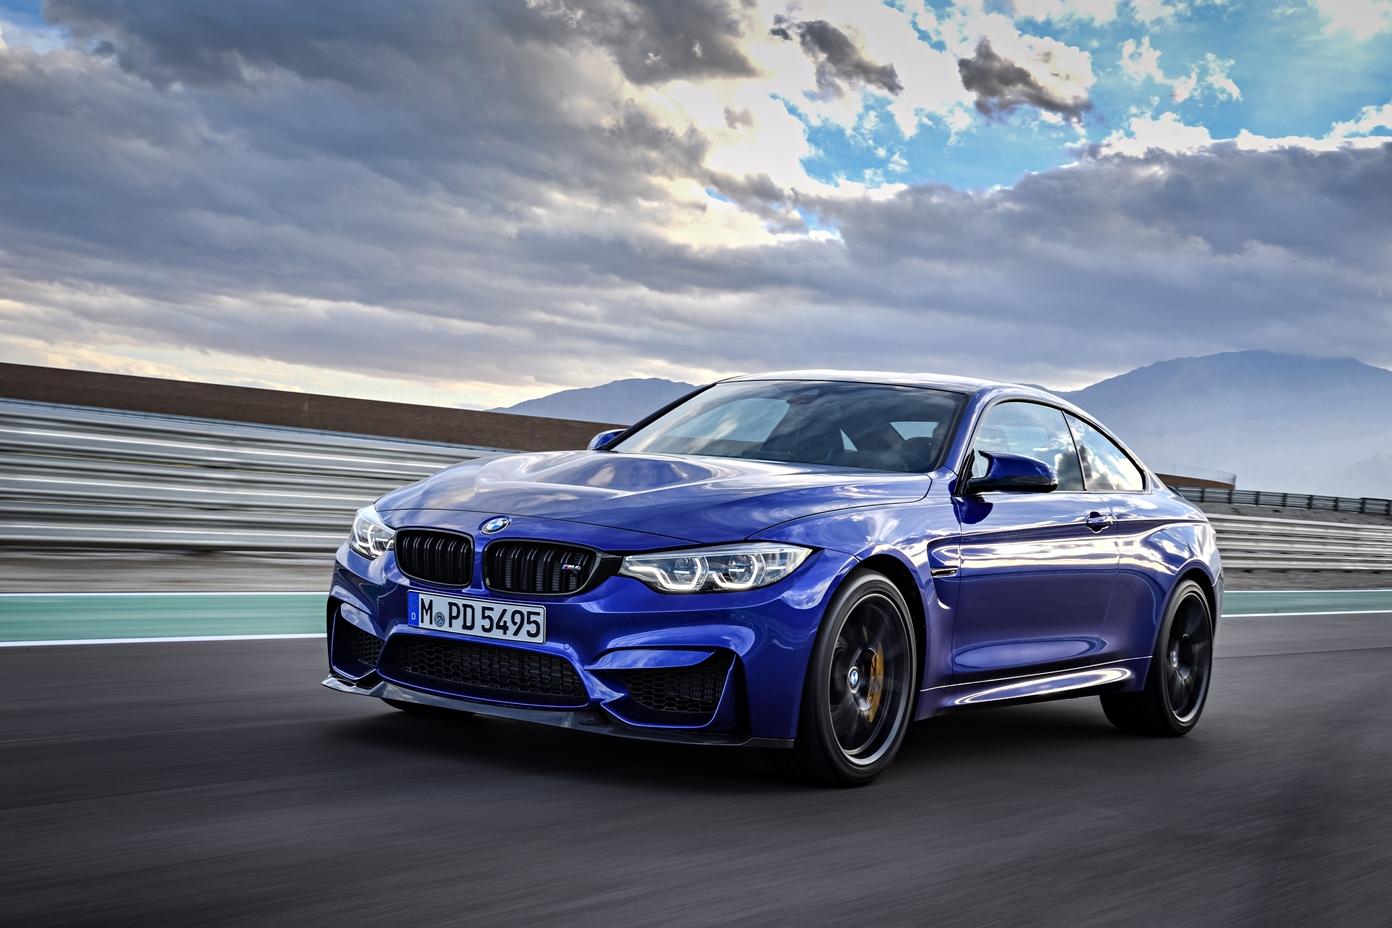 Used Bmw M4 >> 2018-BMW-M4-CS-5 - Art of Gears